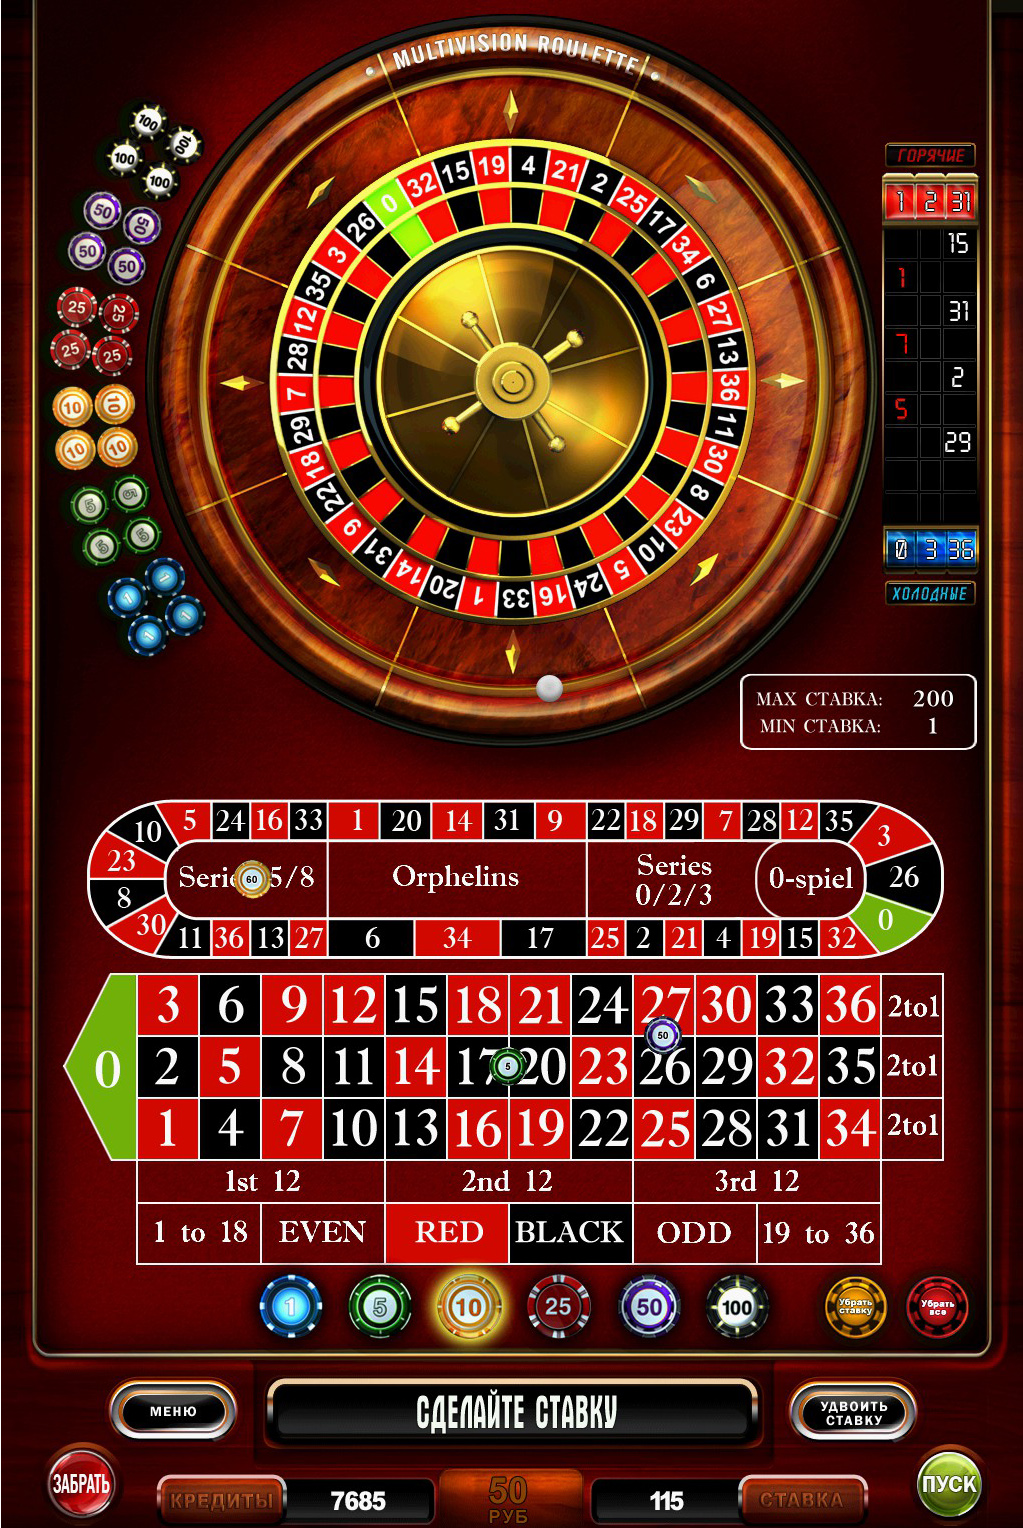 odin-iz-sektorov-ruletki-kazino-ne